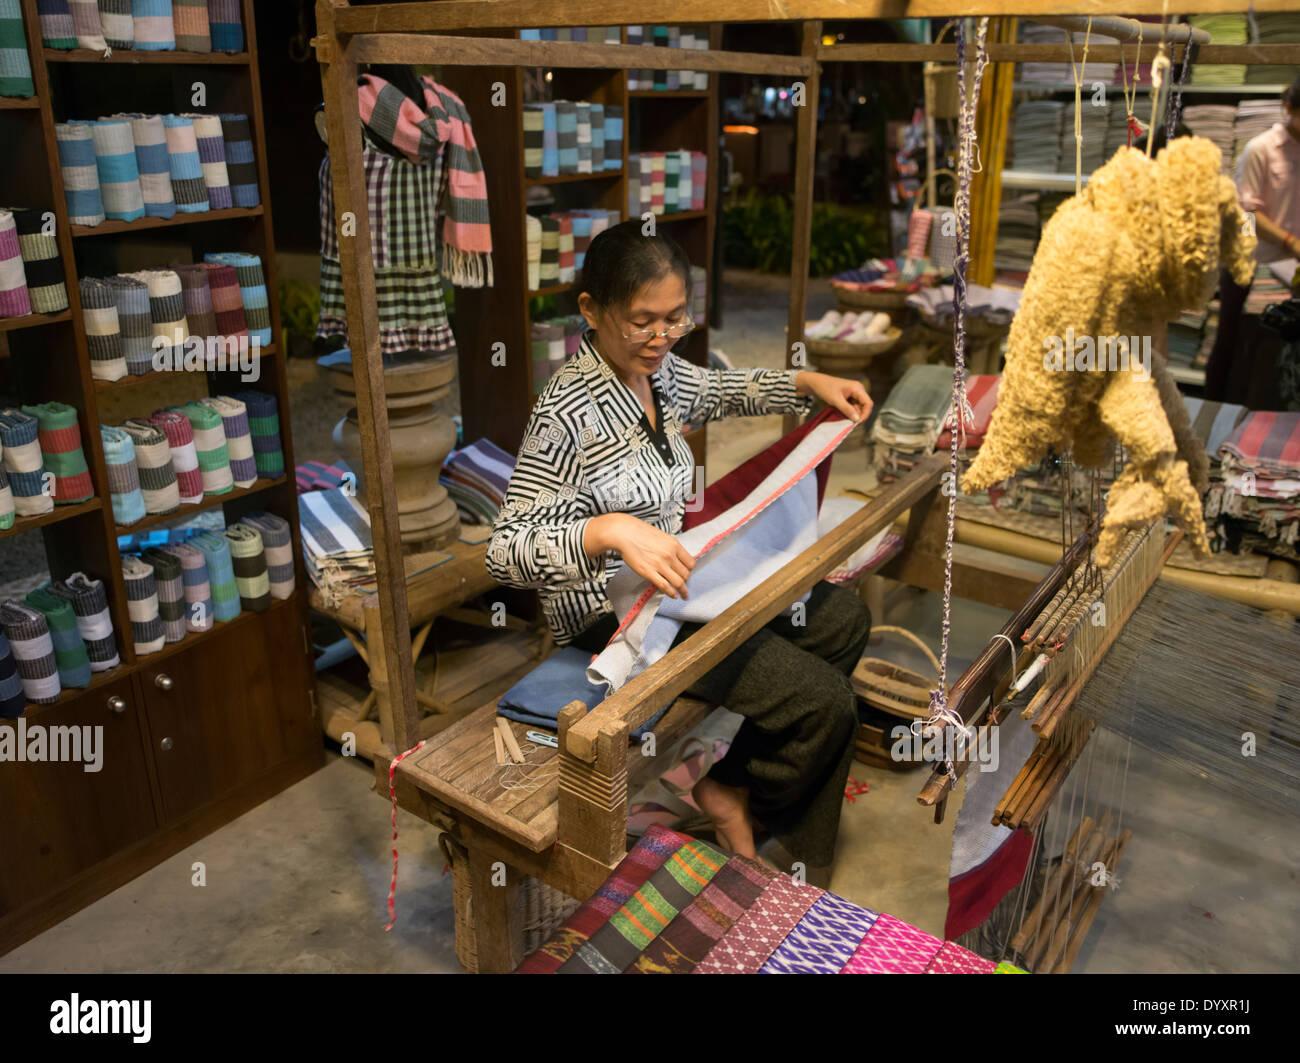 Woman weaving cloth in Angkor Night Market, Siem Reap, Cambodia - Stock Image